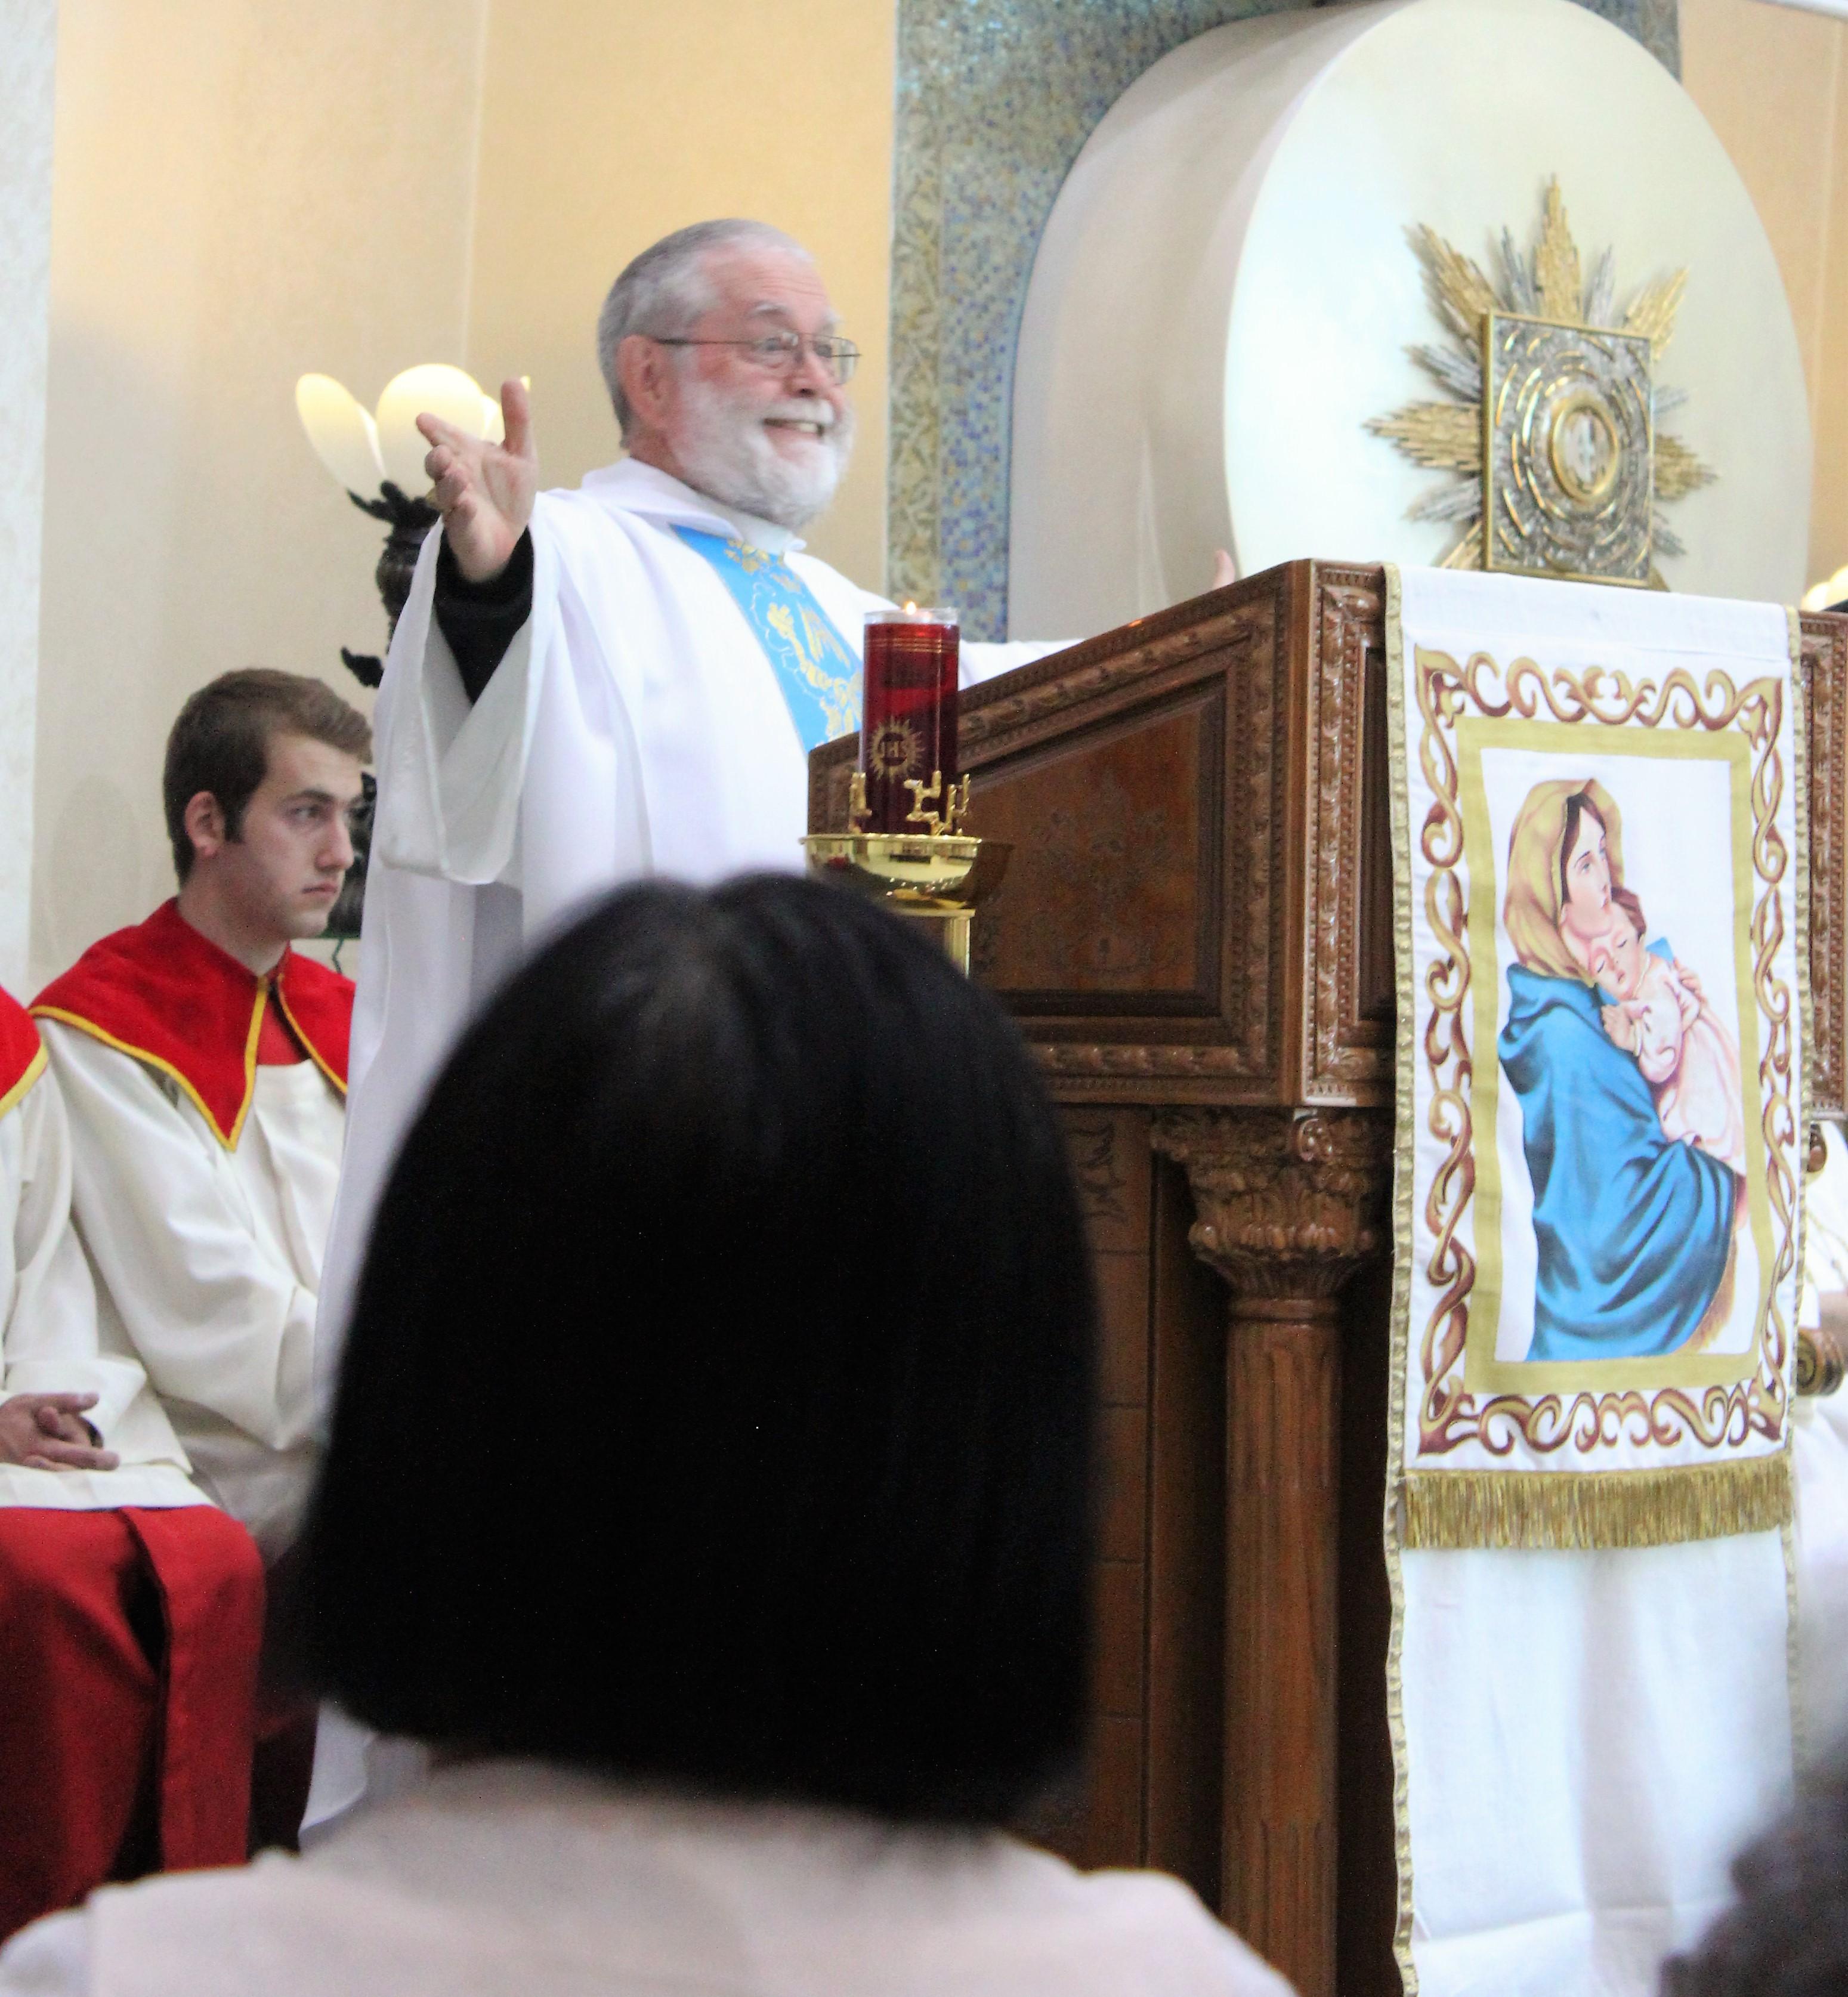 Fr. John embracing the people